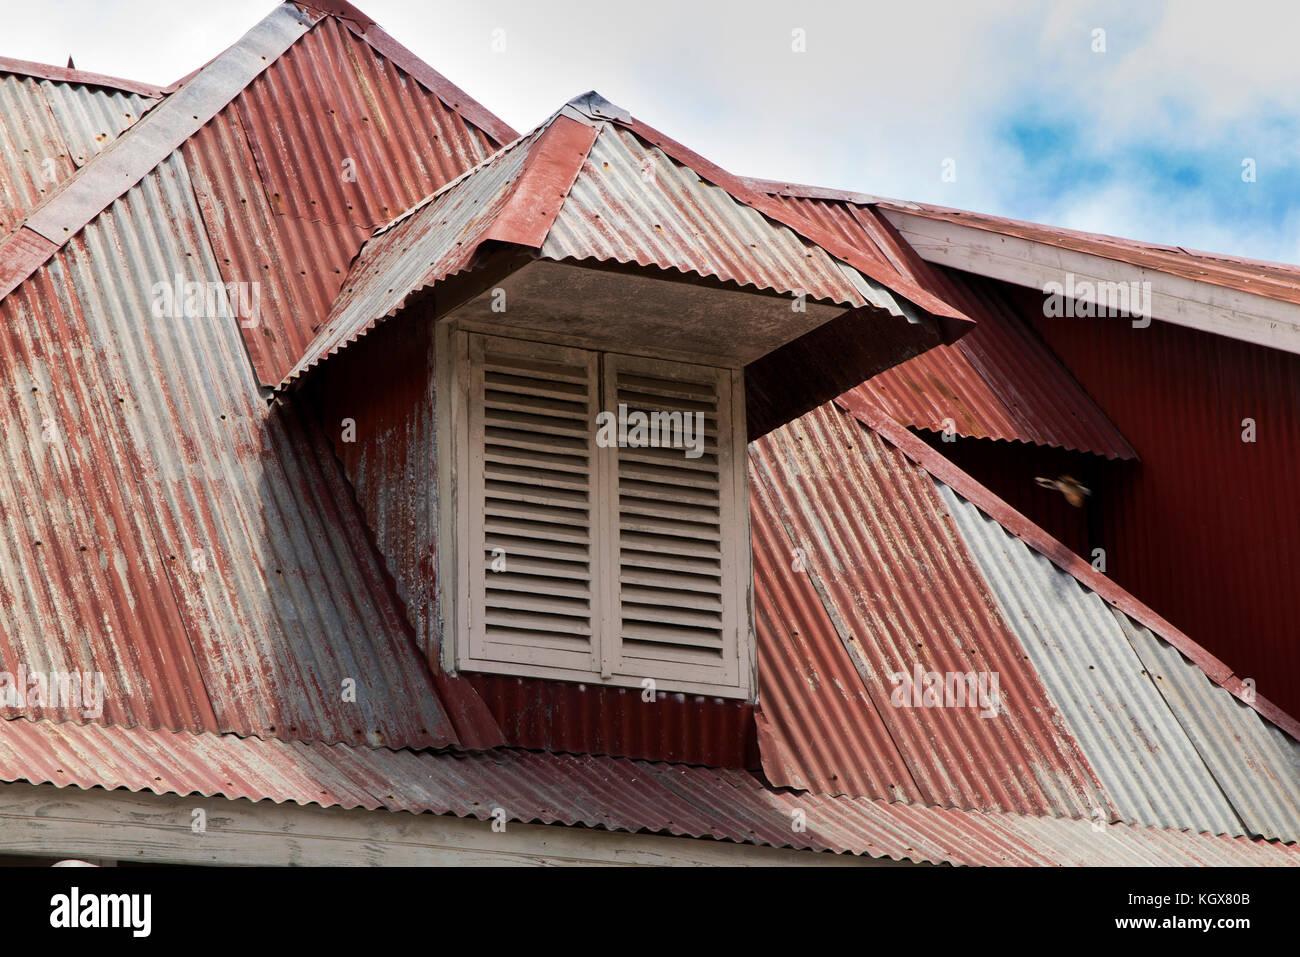 Roof dormer photos roof dormer images alamy for Maison toit tole